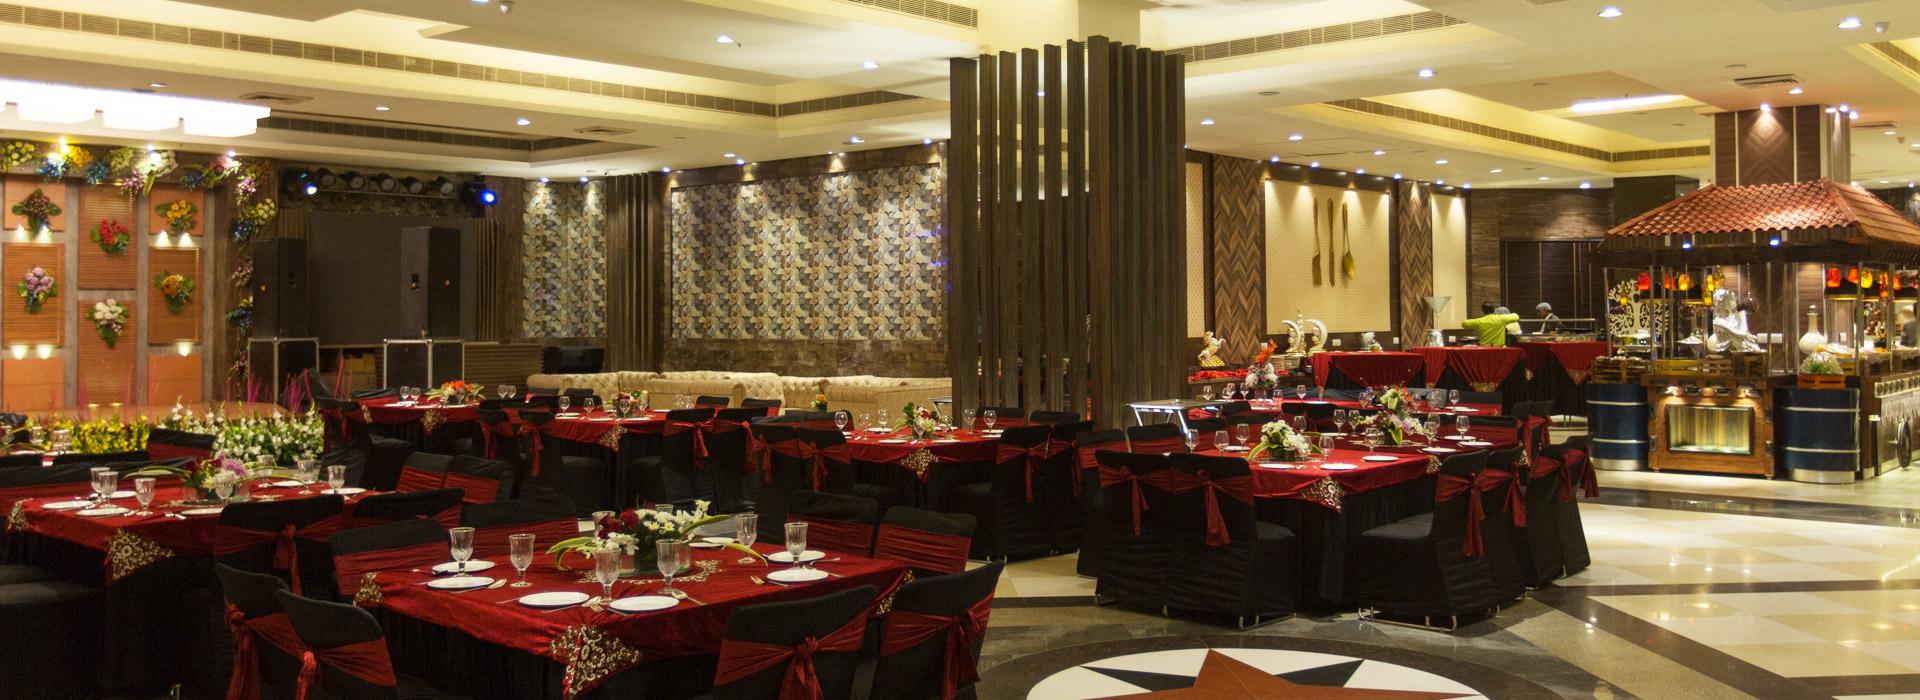 Casabella Banquet Hall In Gurgaon Wedding Venue Gurgaon Birthday